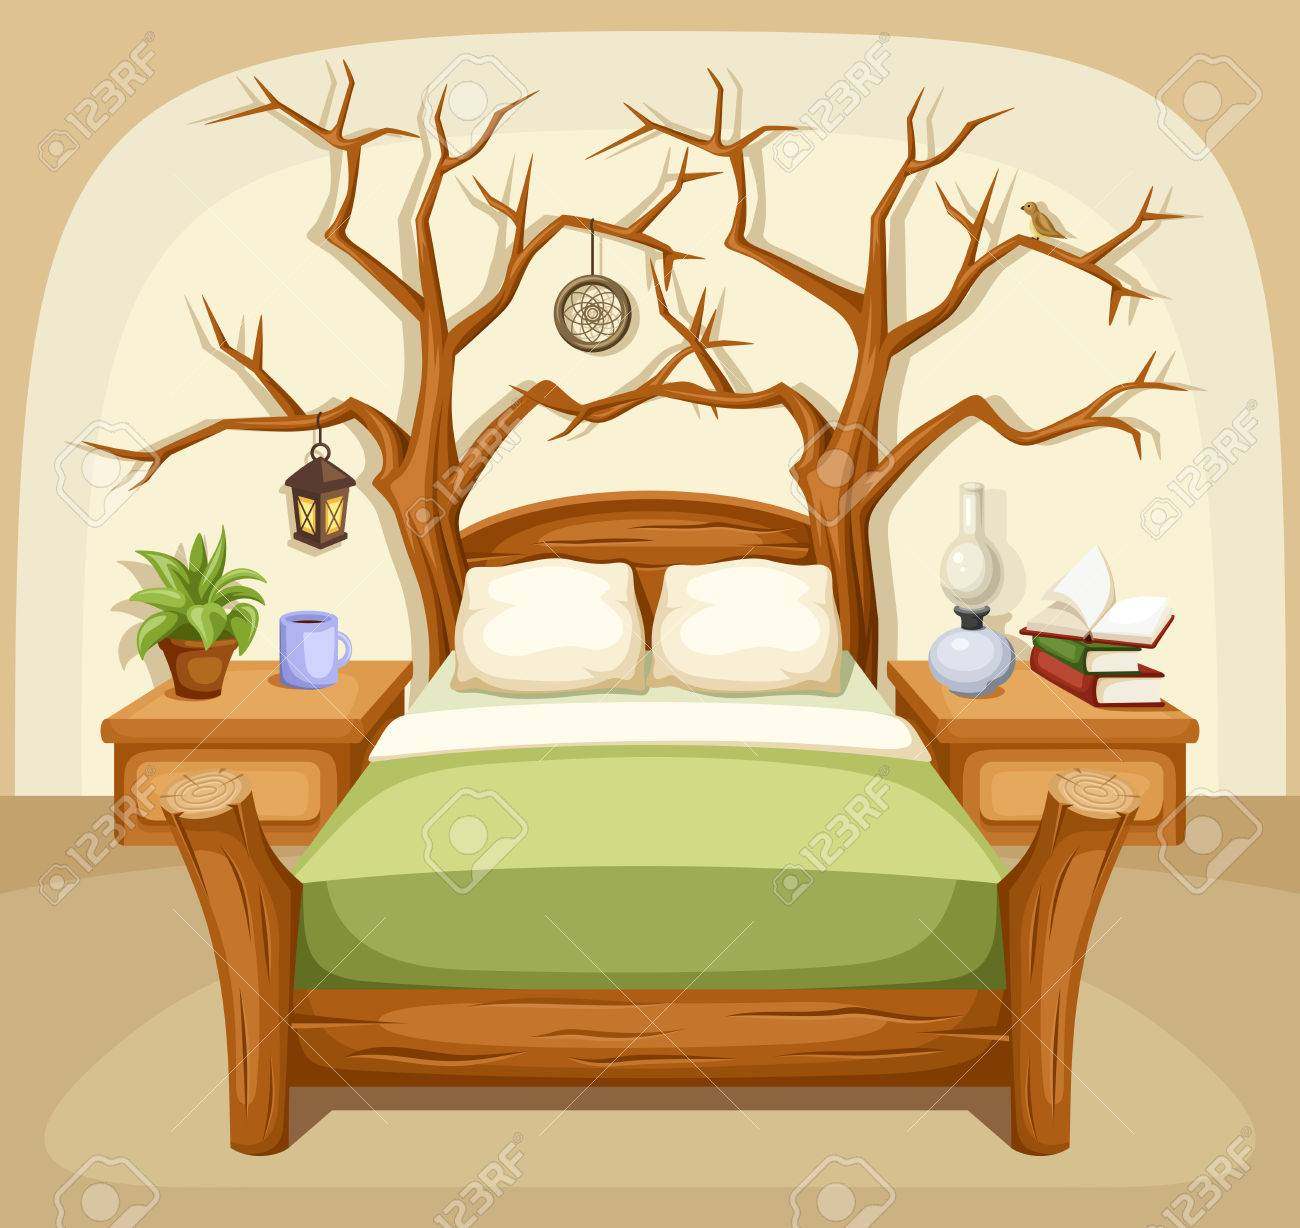 Fantasy Bedroom Interior Vector Illustration Royalty Free Cliparts Vectors And Stock Illustration Image 40588198